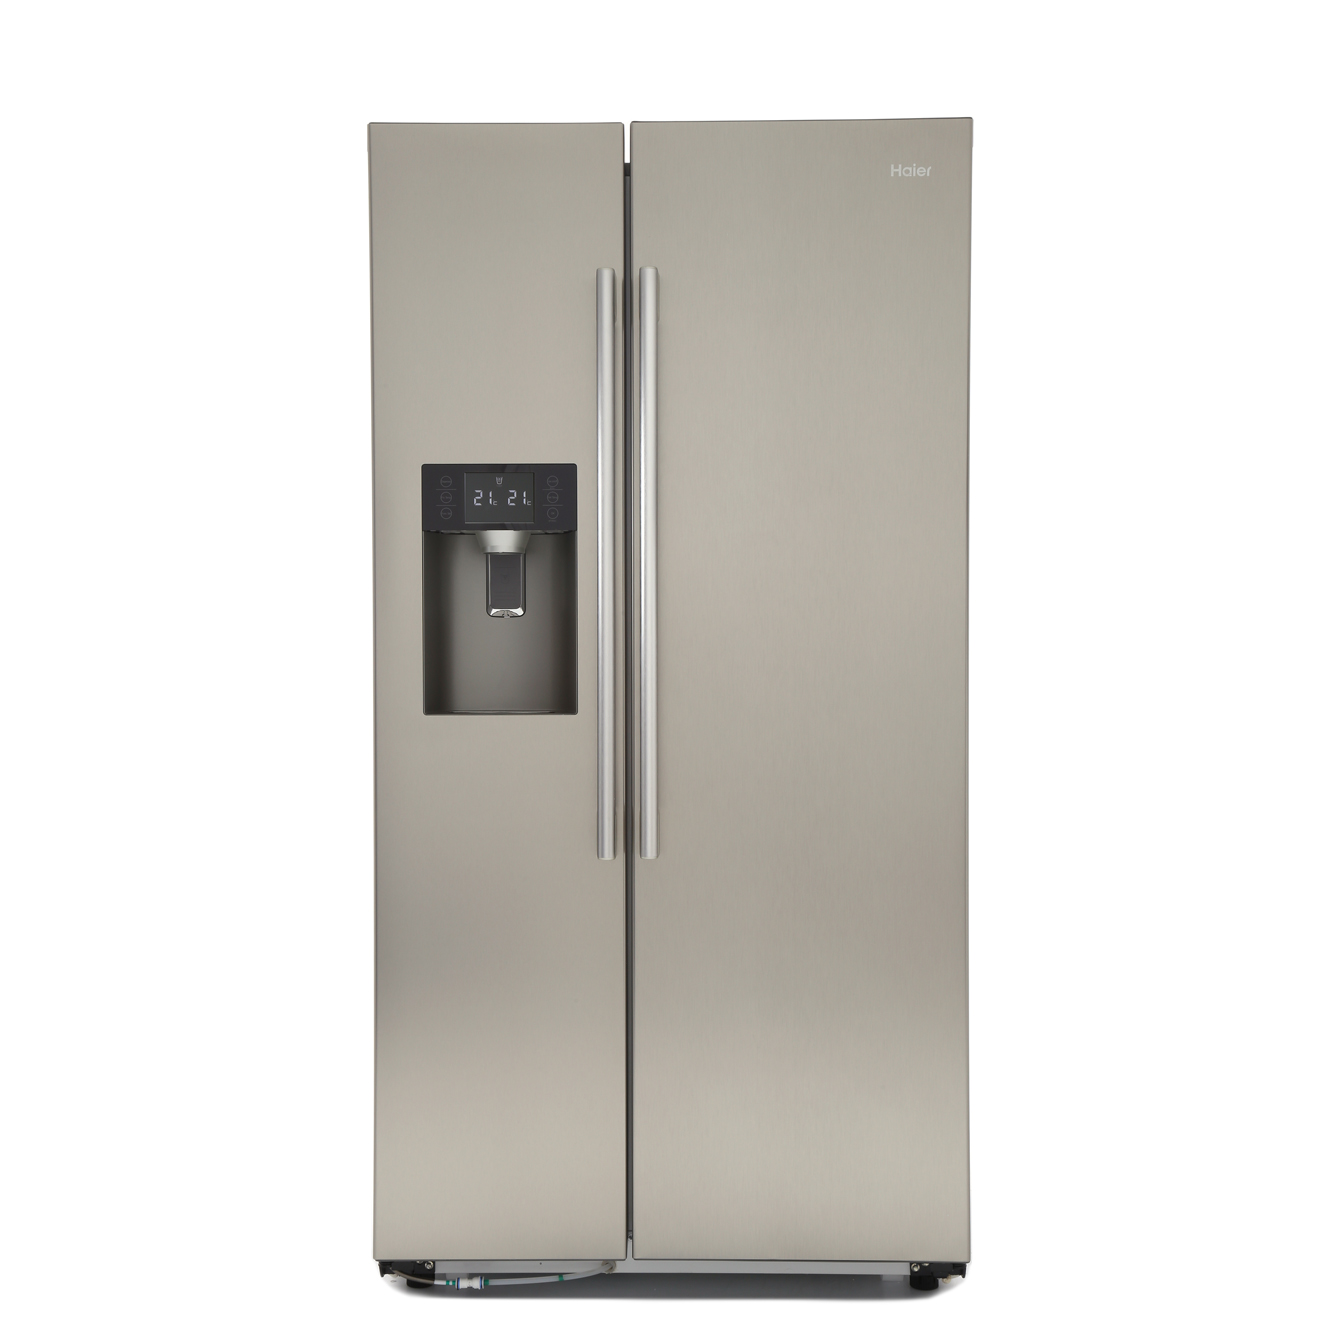 haier american fridge freezer. haier hrf-628if6 american fridge freezer r